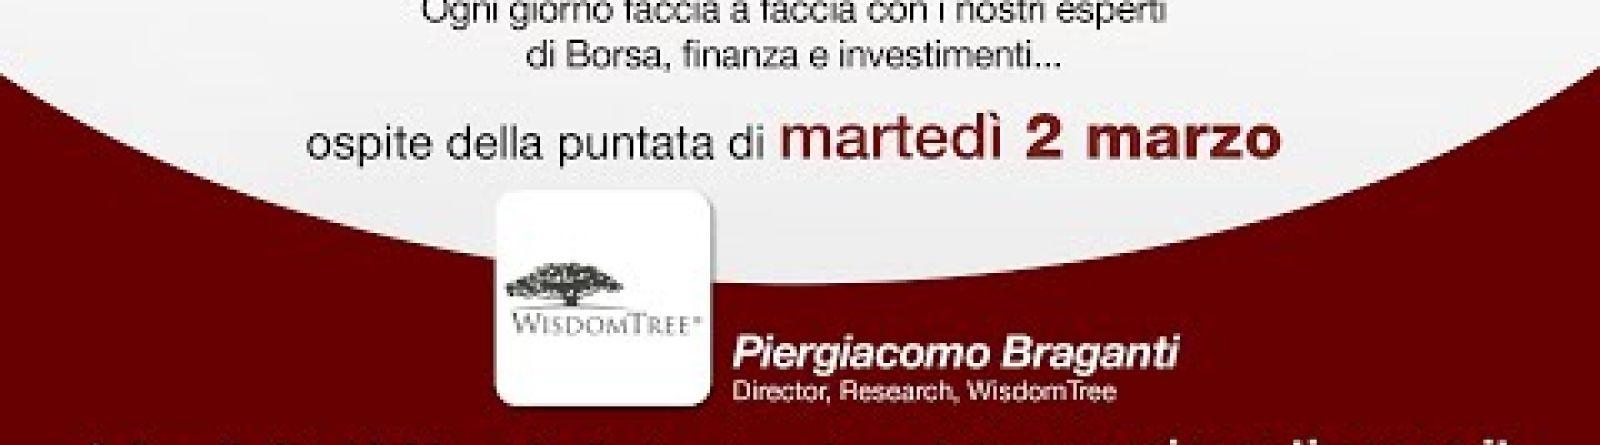 INVESTIRE Now Oggi ospite Piergiacomo Braganti, Director, Research, WisdomTree